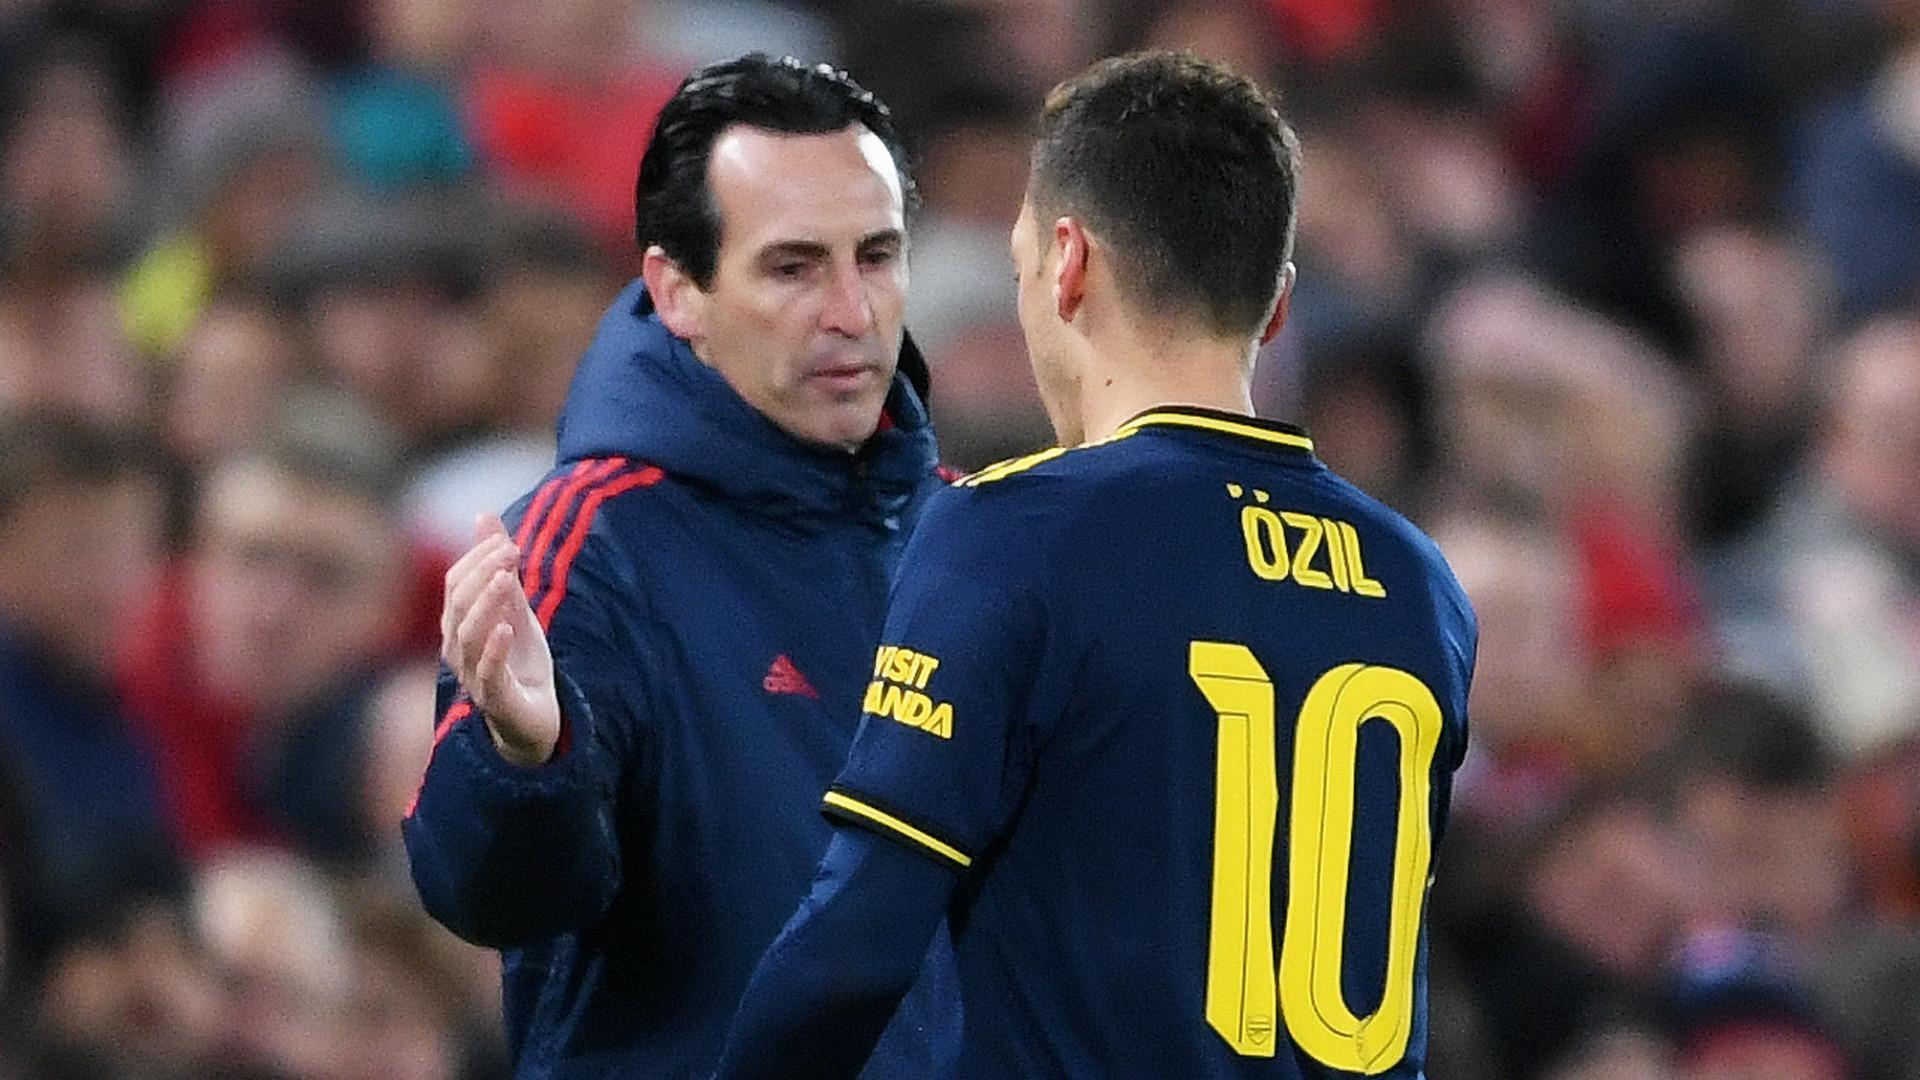 Unai Emery Mesut Ozil Arsenal 2019-20